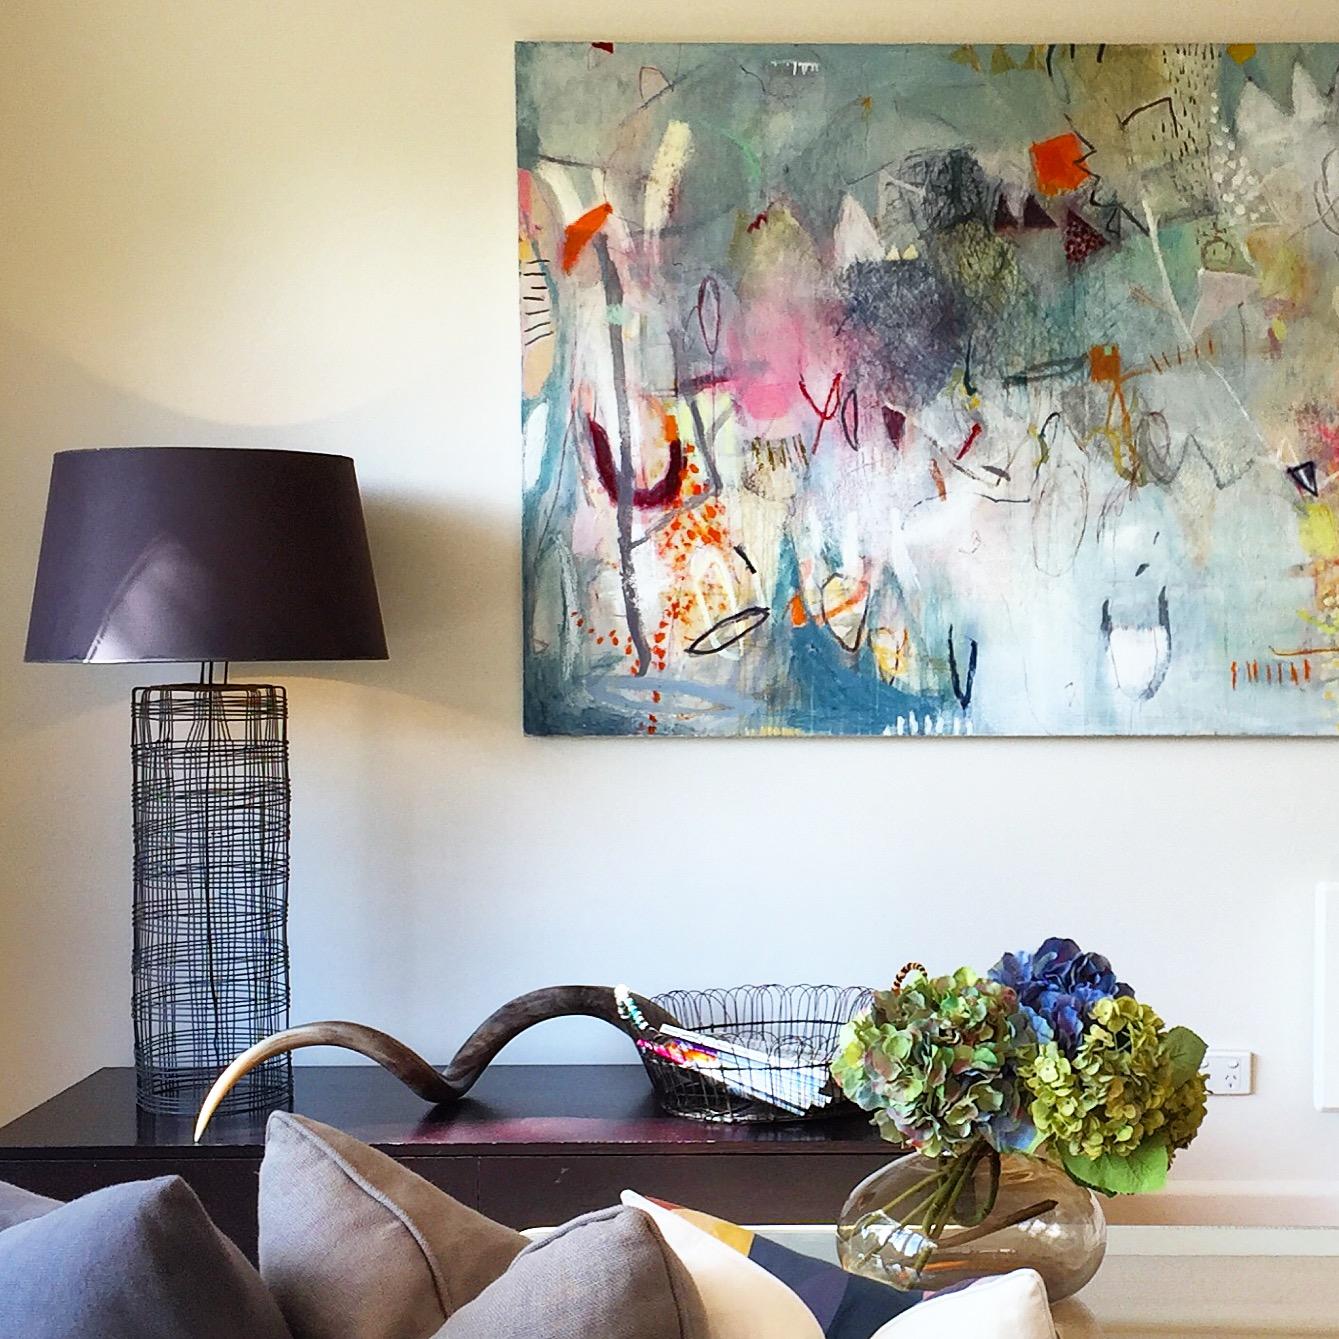 Michelle Breton,  Collioure,  Acrylic on Canvas, 117.5 x 203cm, $12,000